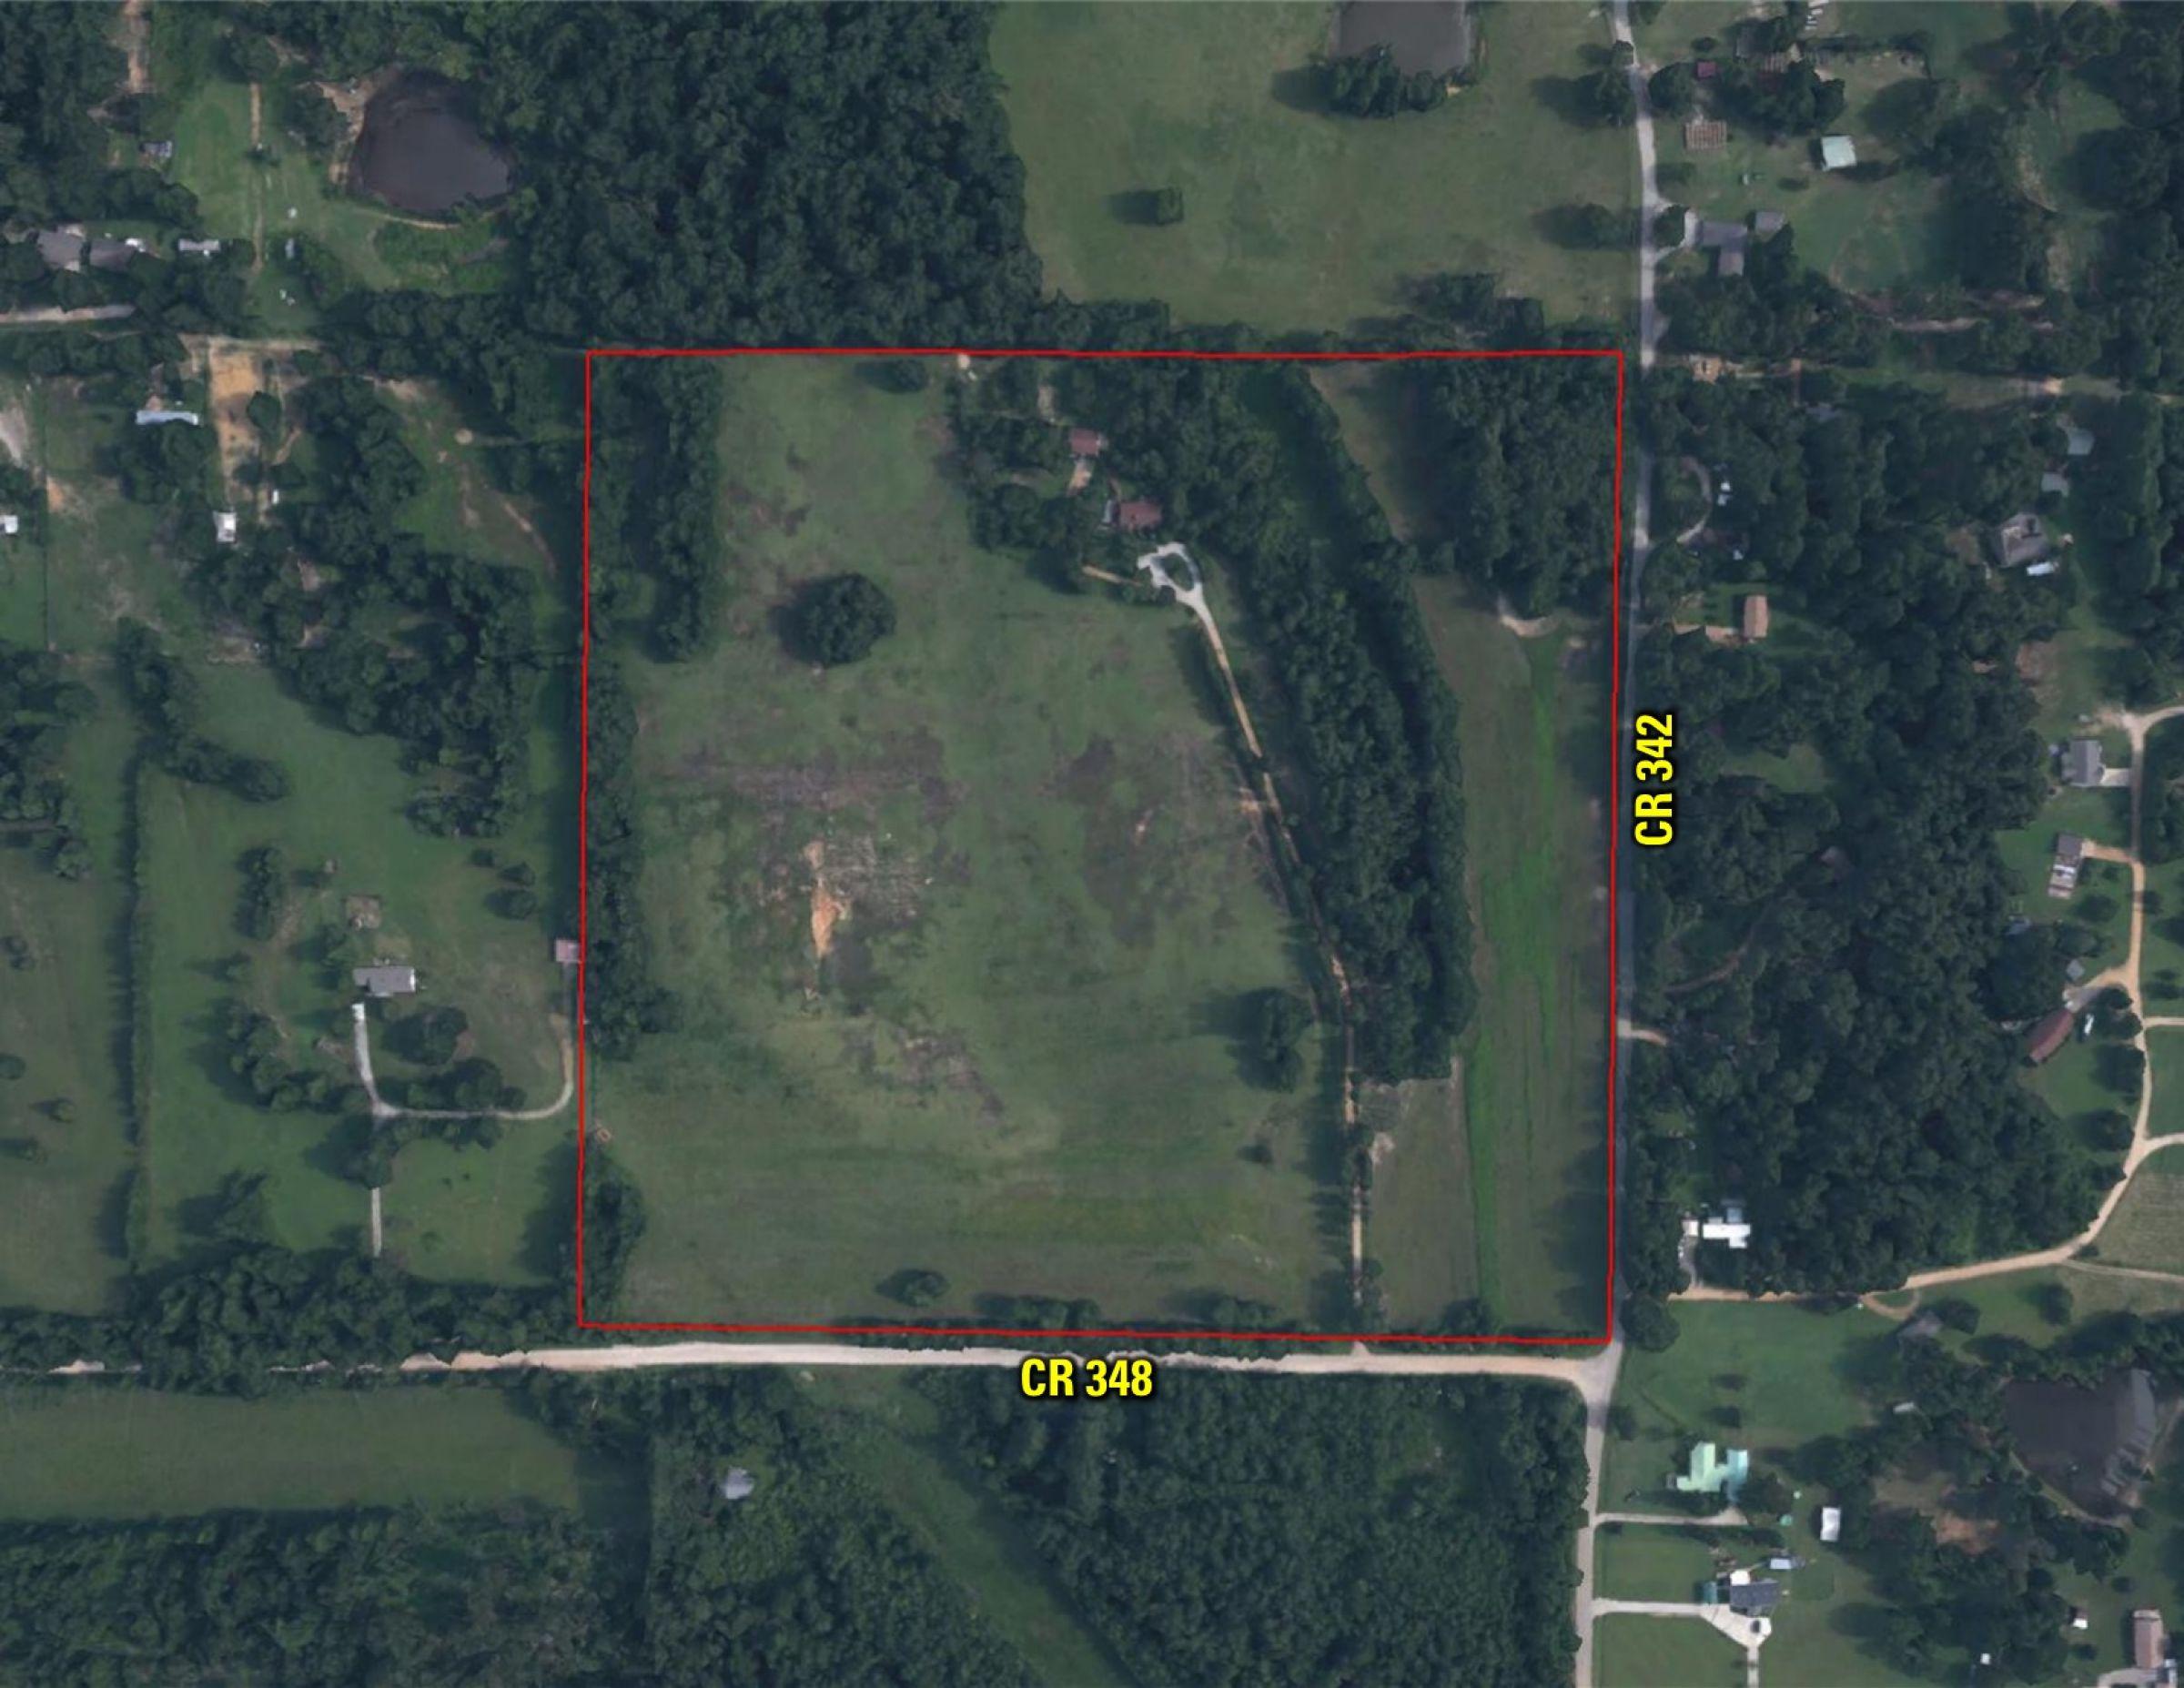 land-craighead-county-arkansas-52-acres-listing-number-15002-0-2020-06-11-144114.jpg